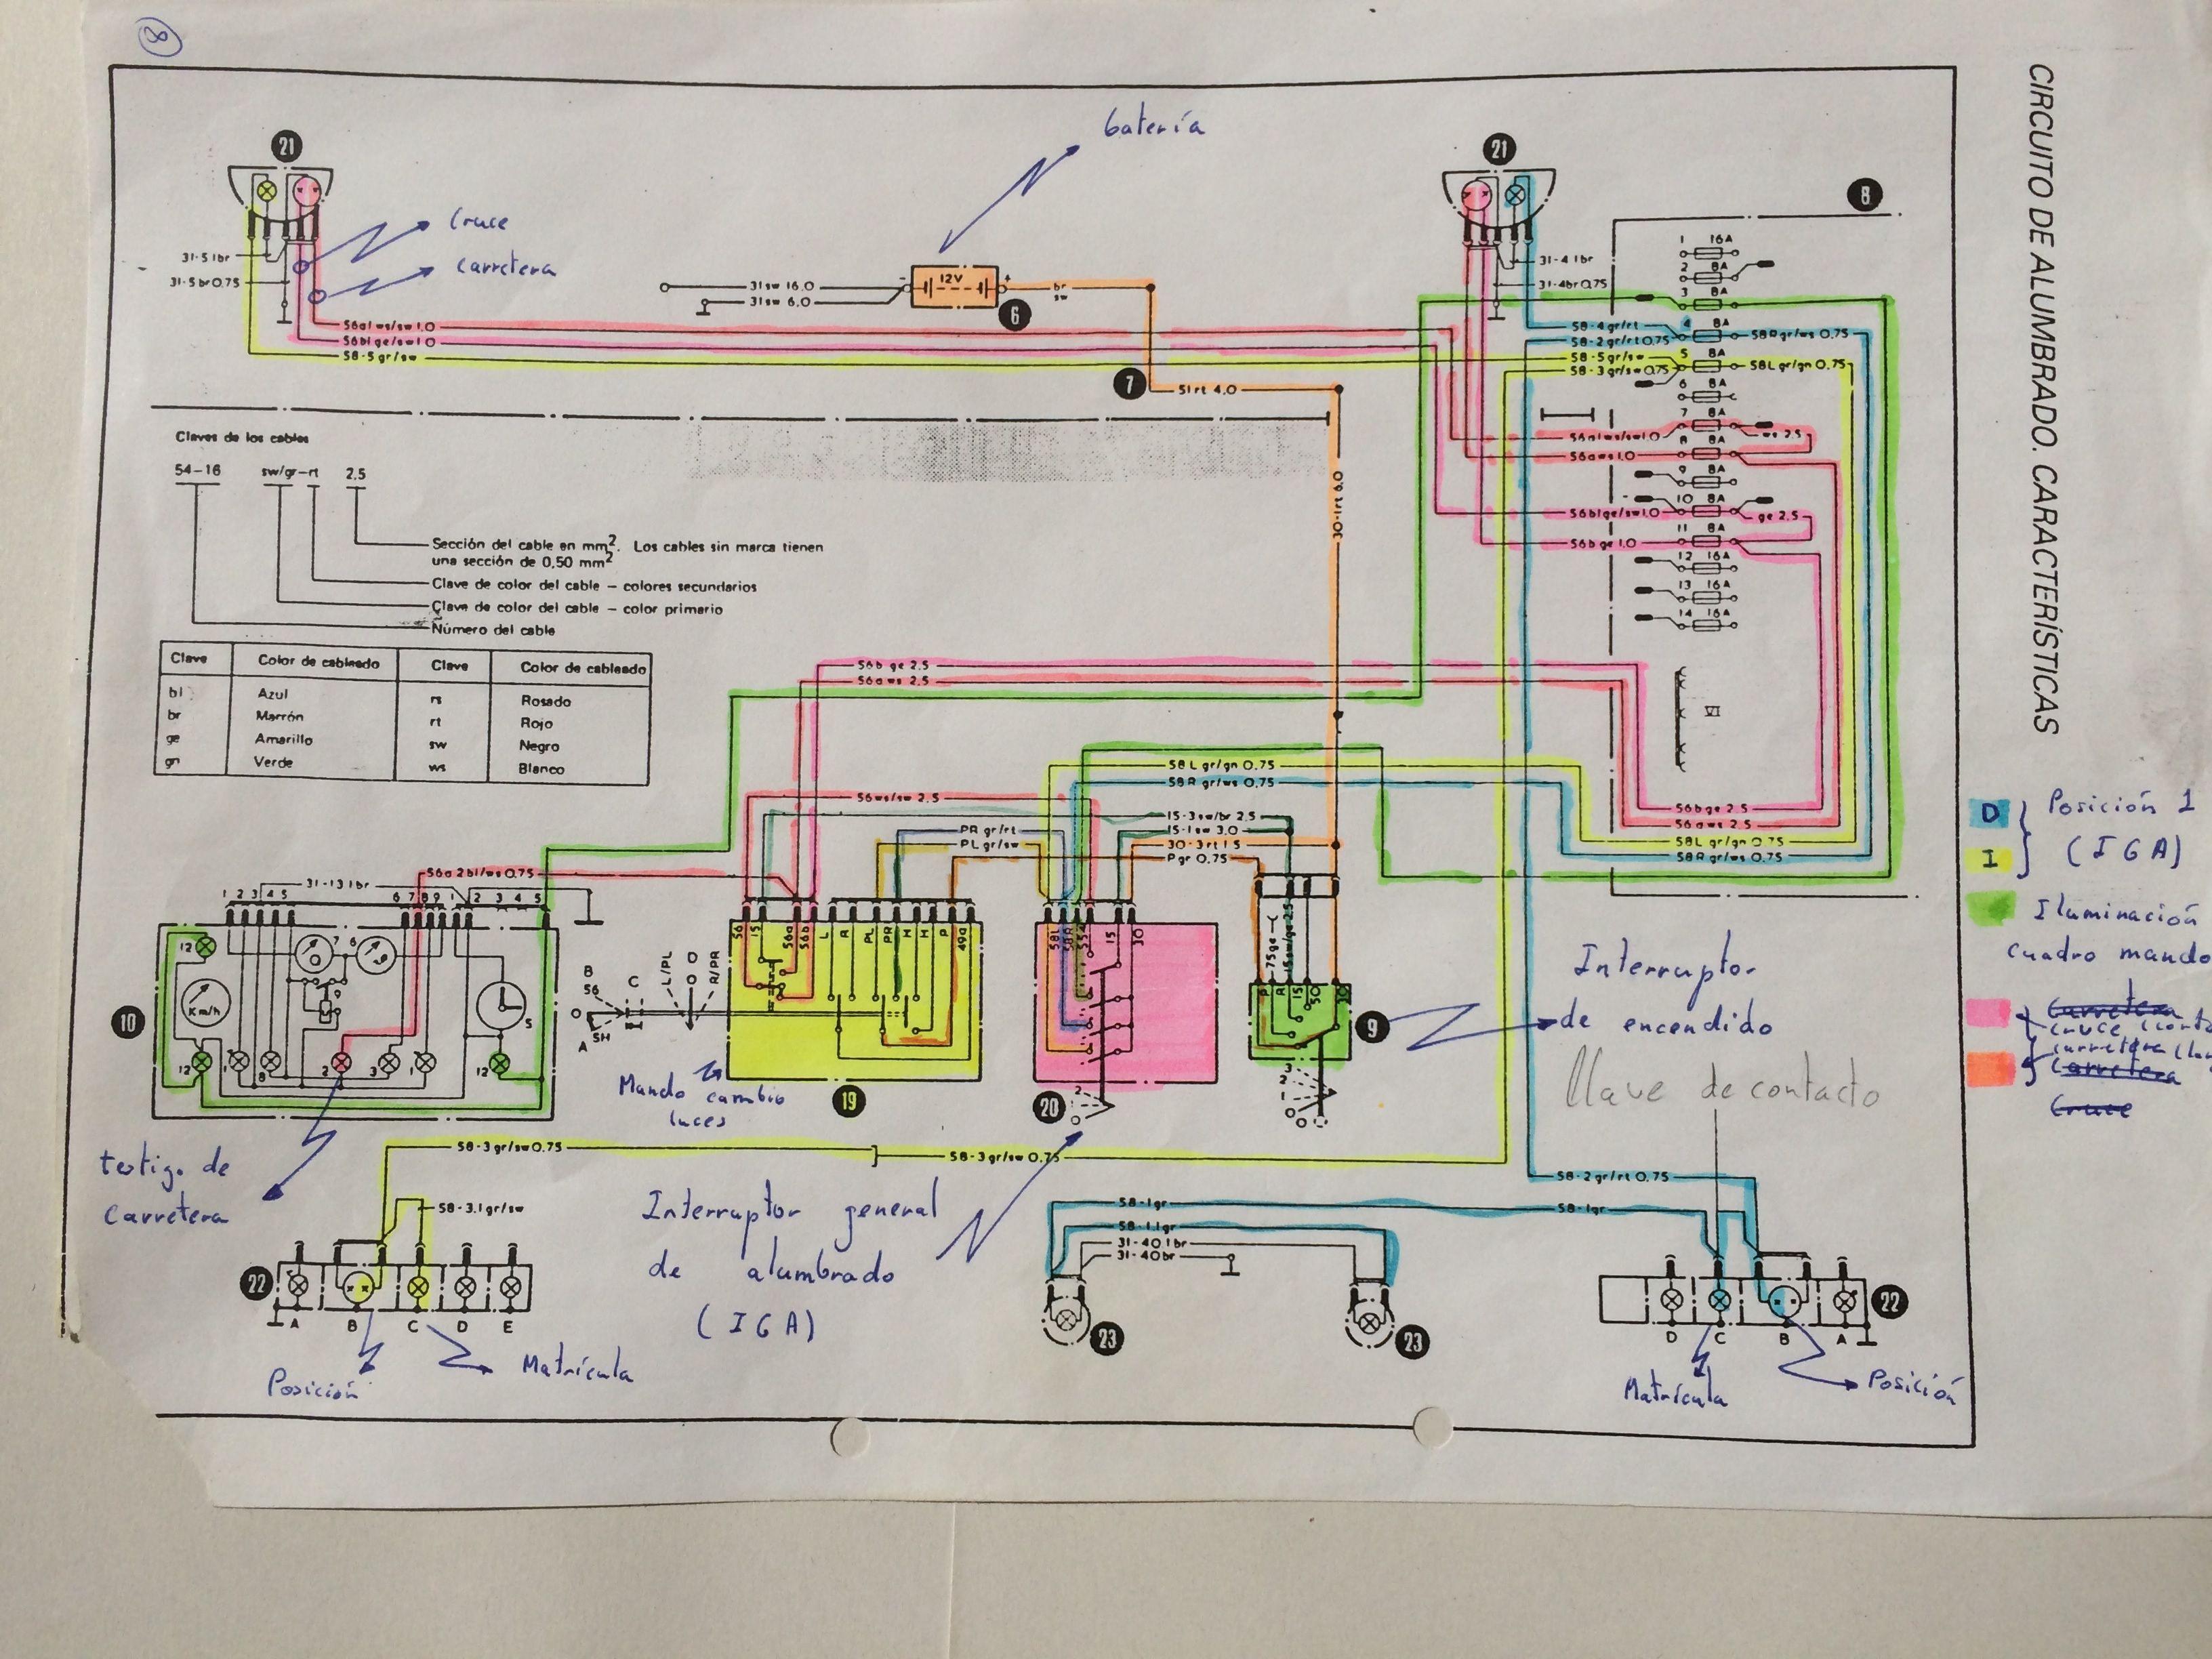 2002 ford escape pcm wiring diagram 1982 ez go golf cart e 150 engine circuit maker